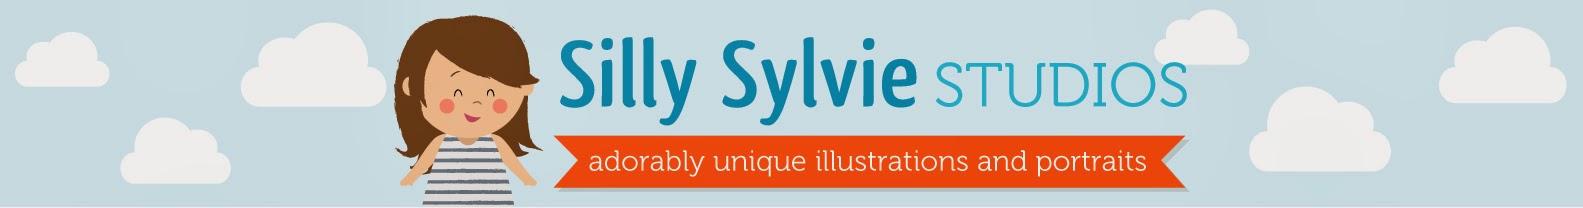 Silly Sylvie